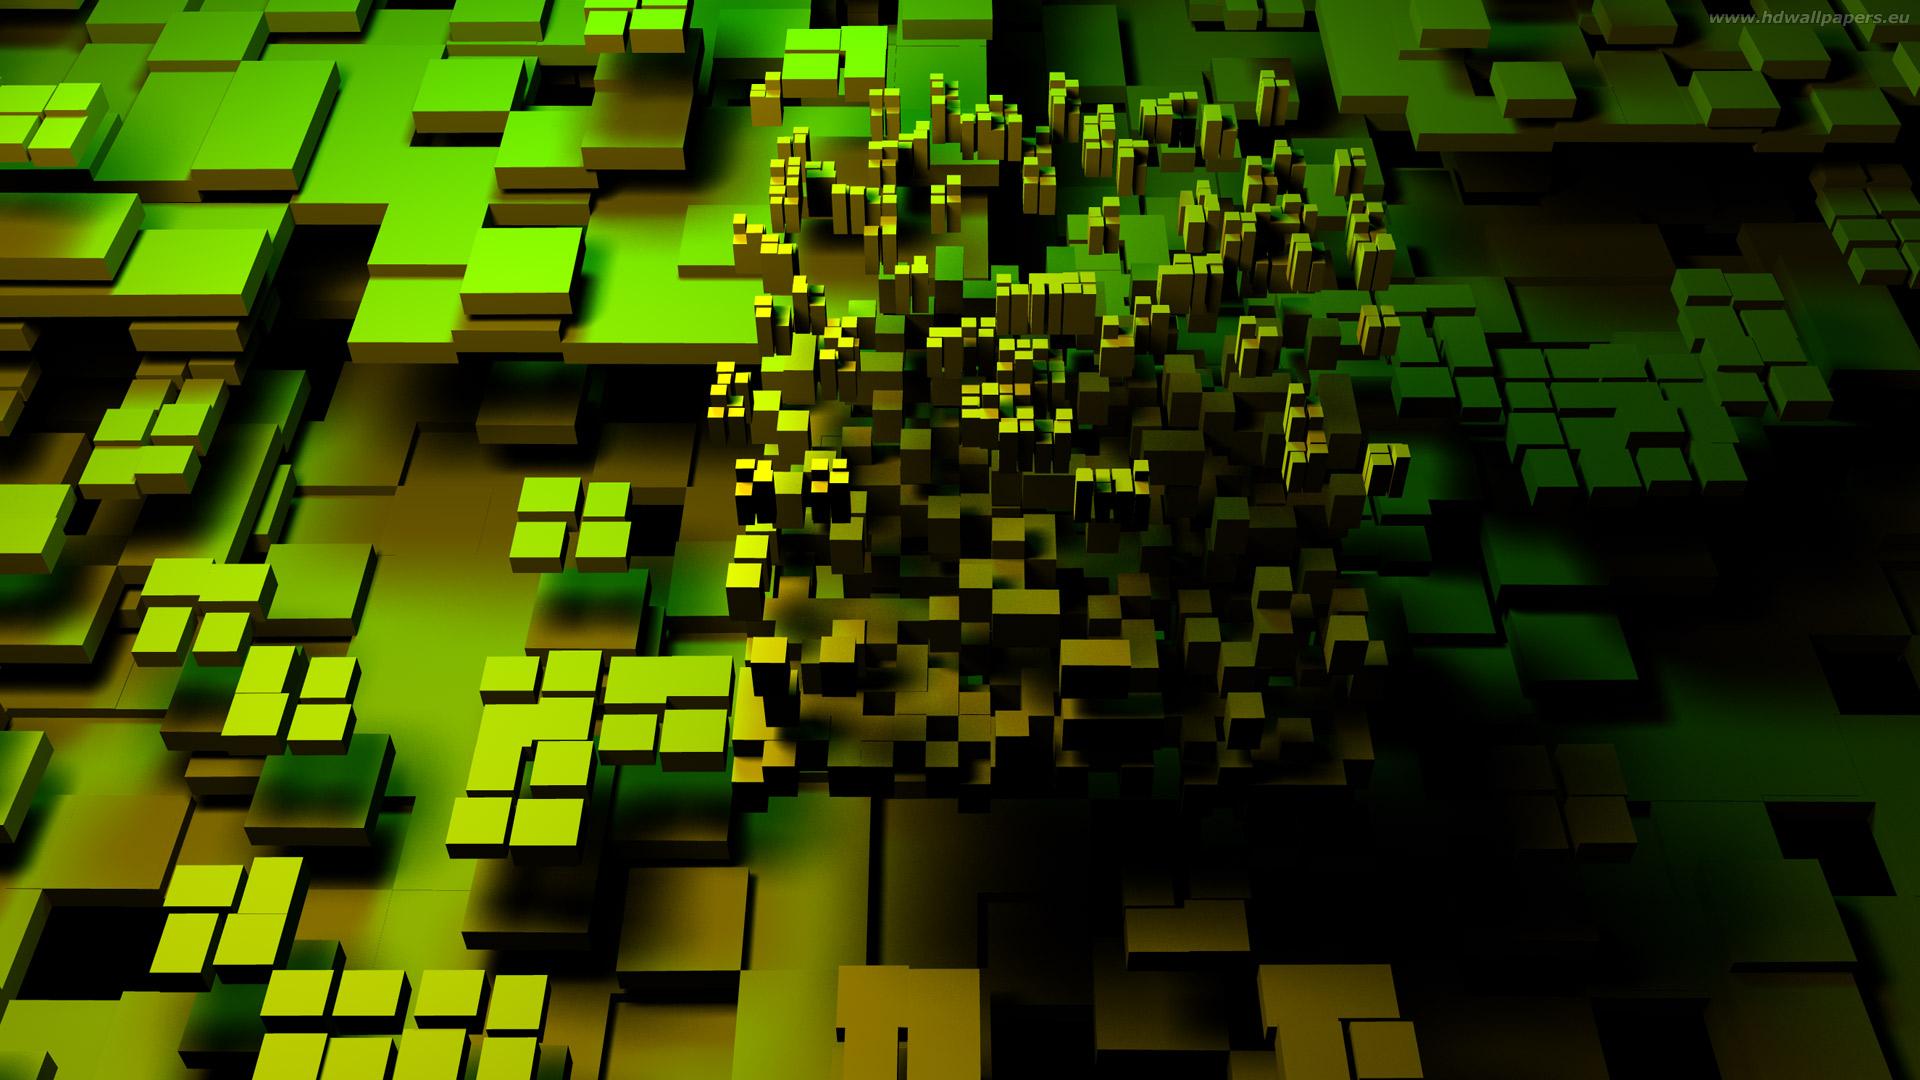 Tron Desktop Wallpaper 3d 1080p 3d Backgrounds Pixelstalk Net